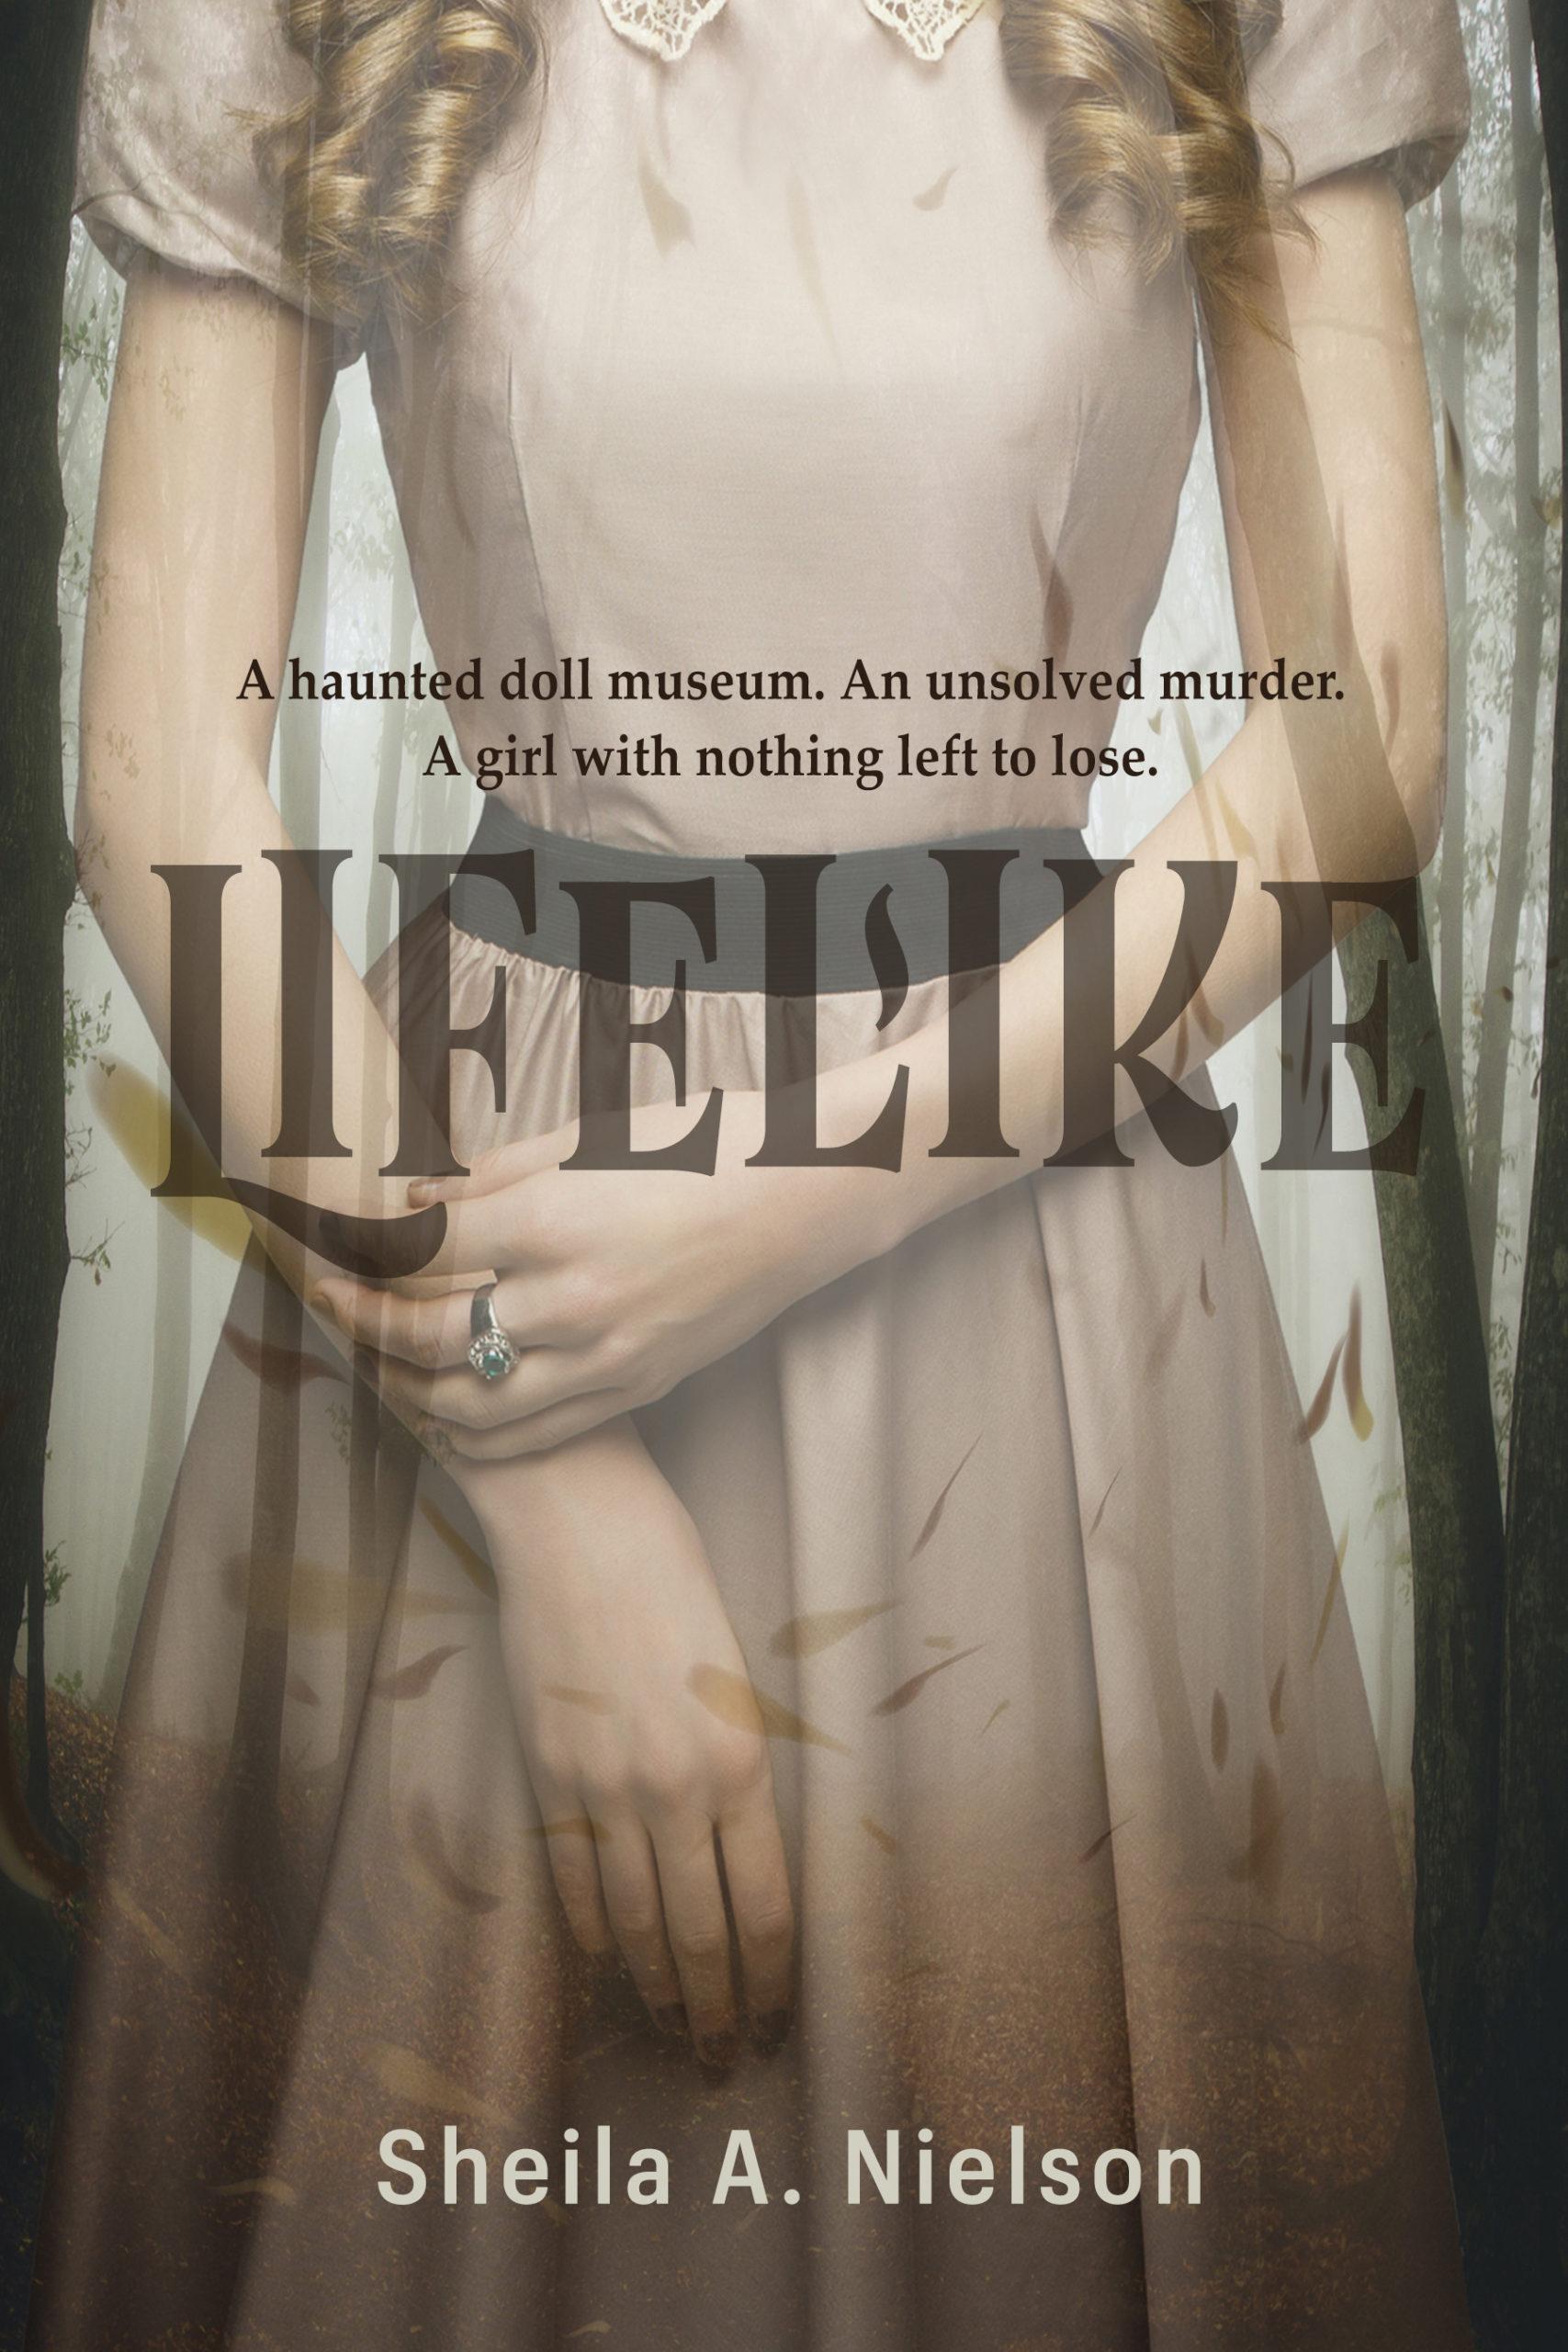 Lifelike by Sheila A. Nielson